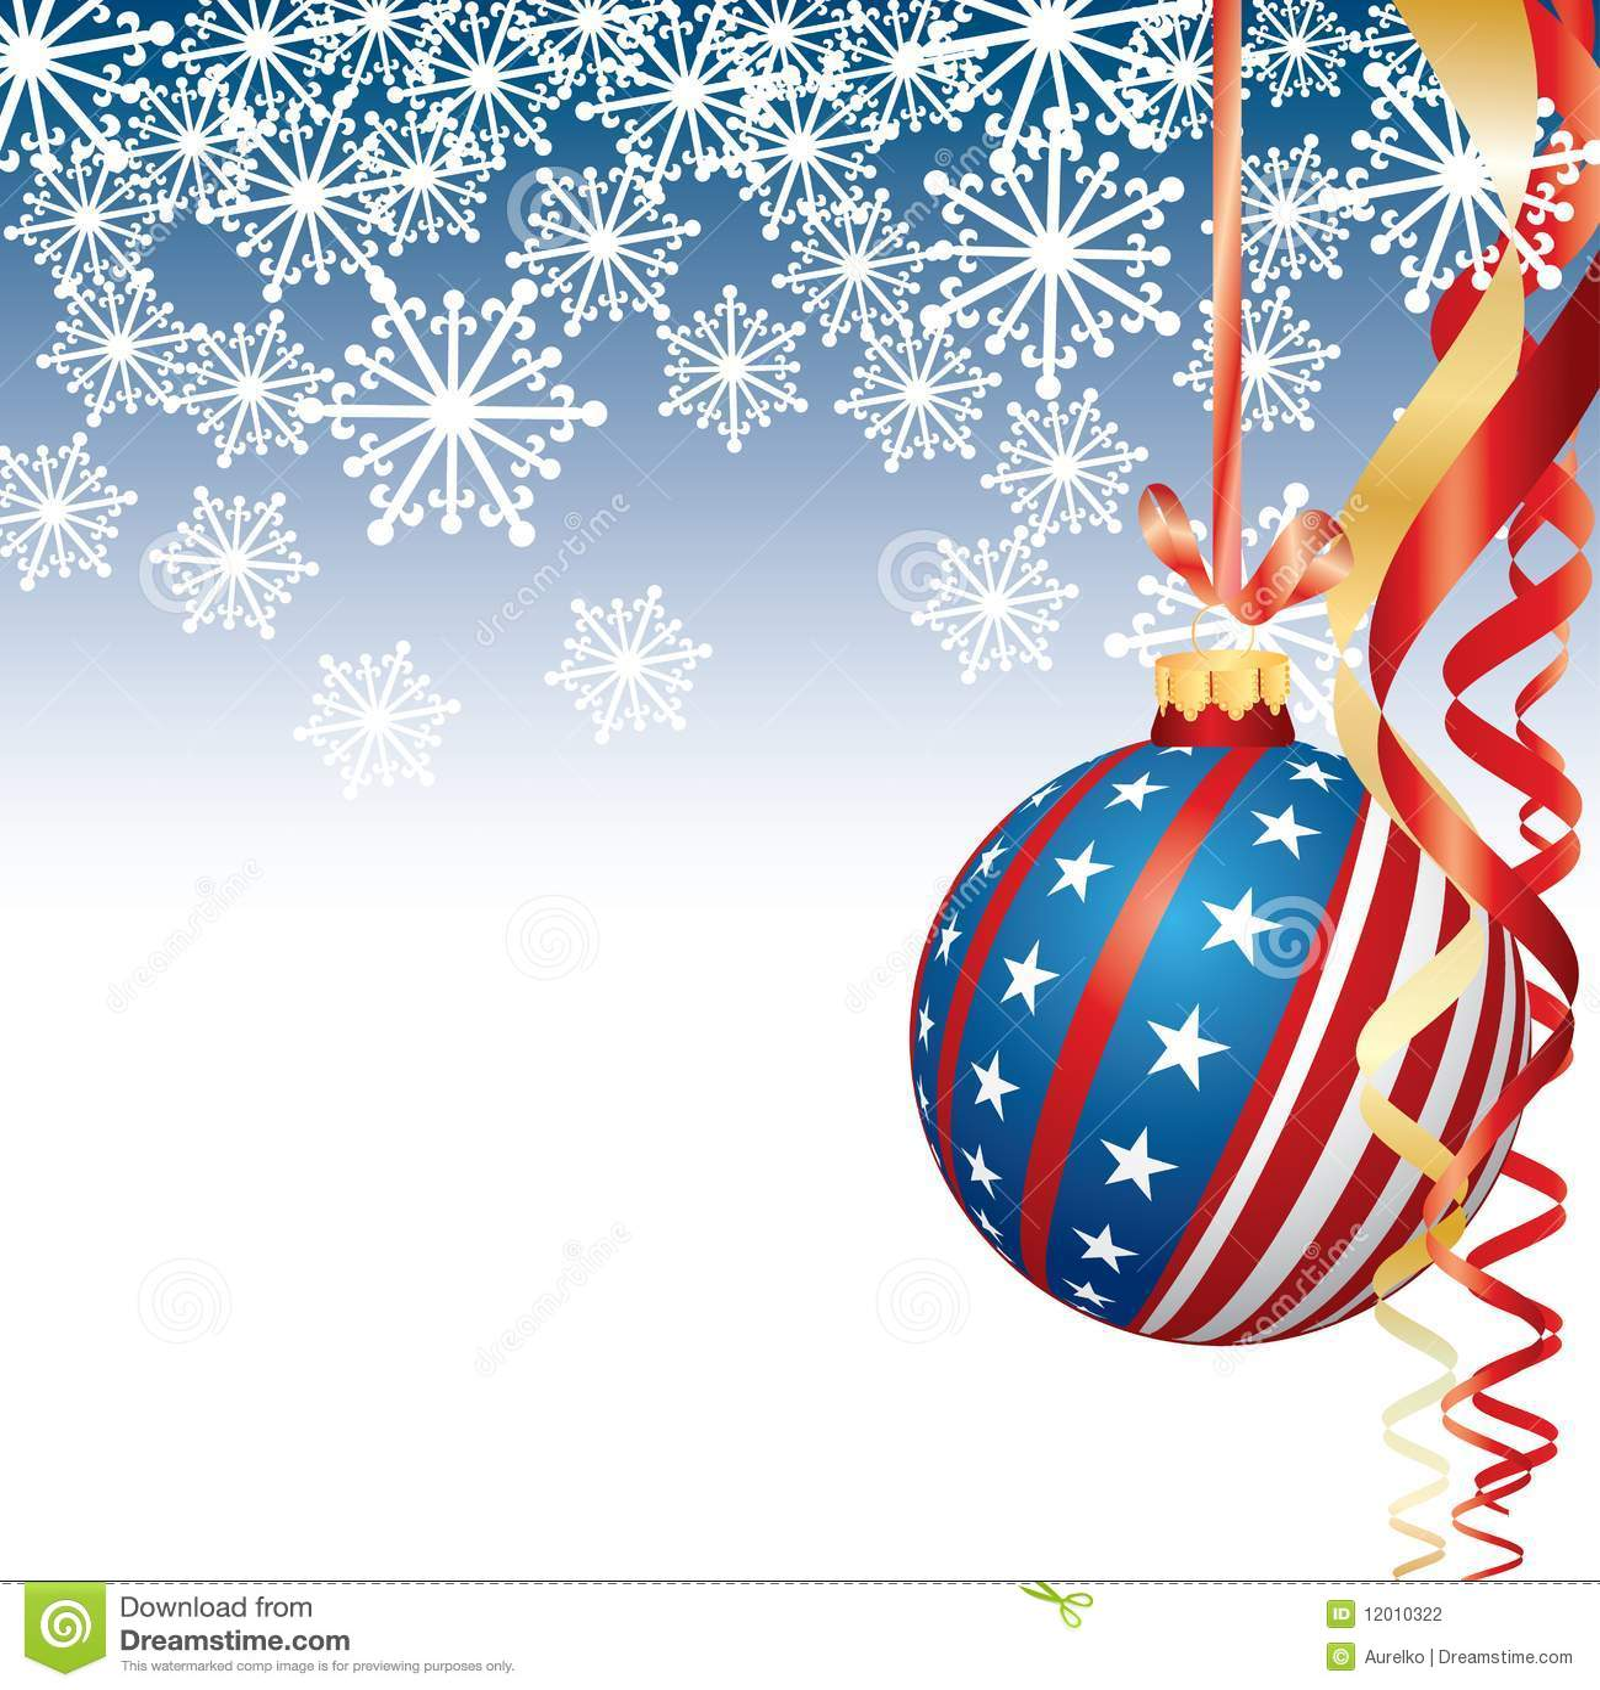 Patriotic Christmas.Patriotic Christmas Stock Vector Illustration Of Concepts